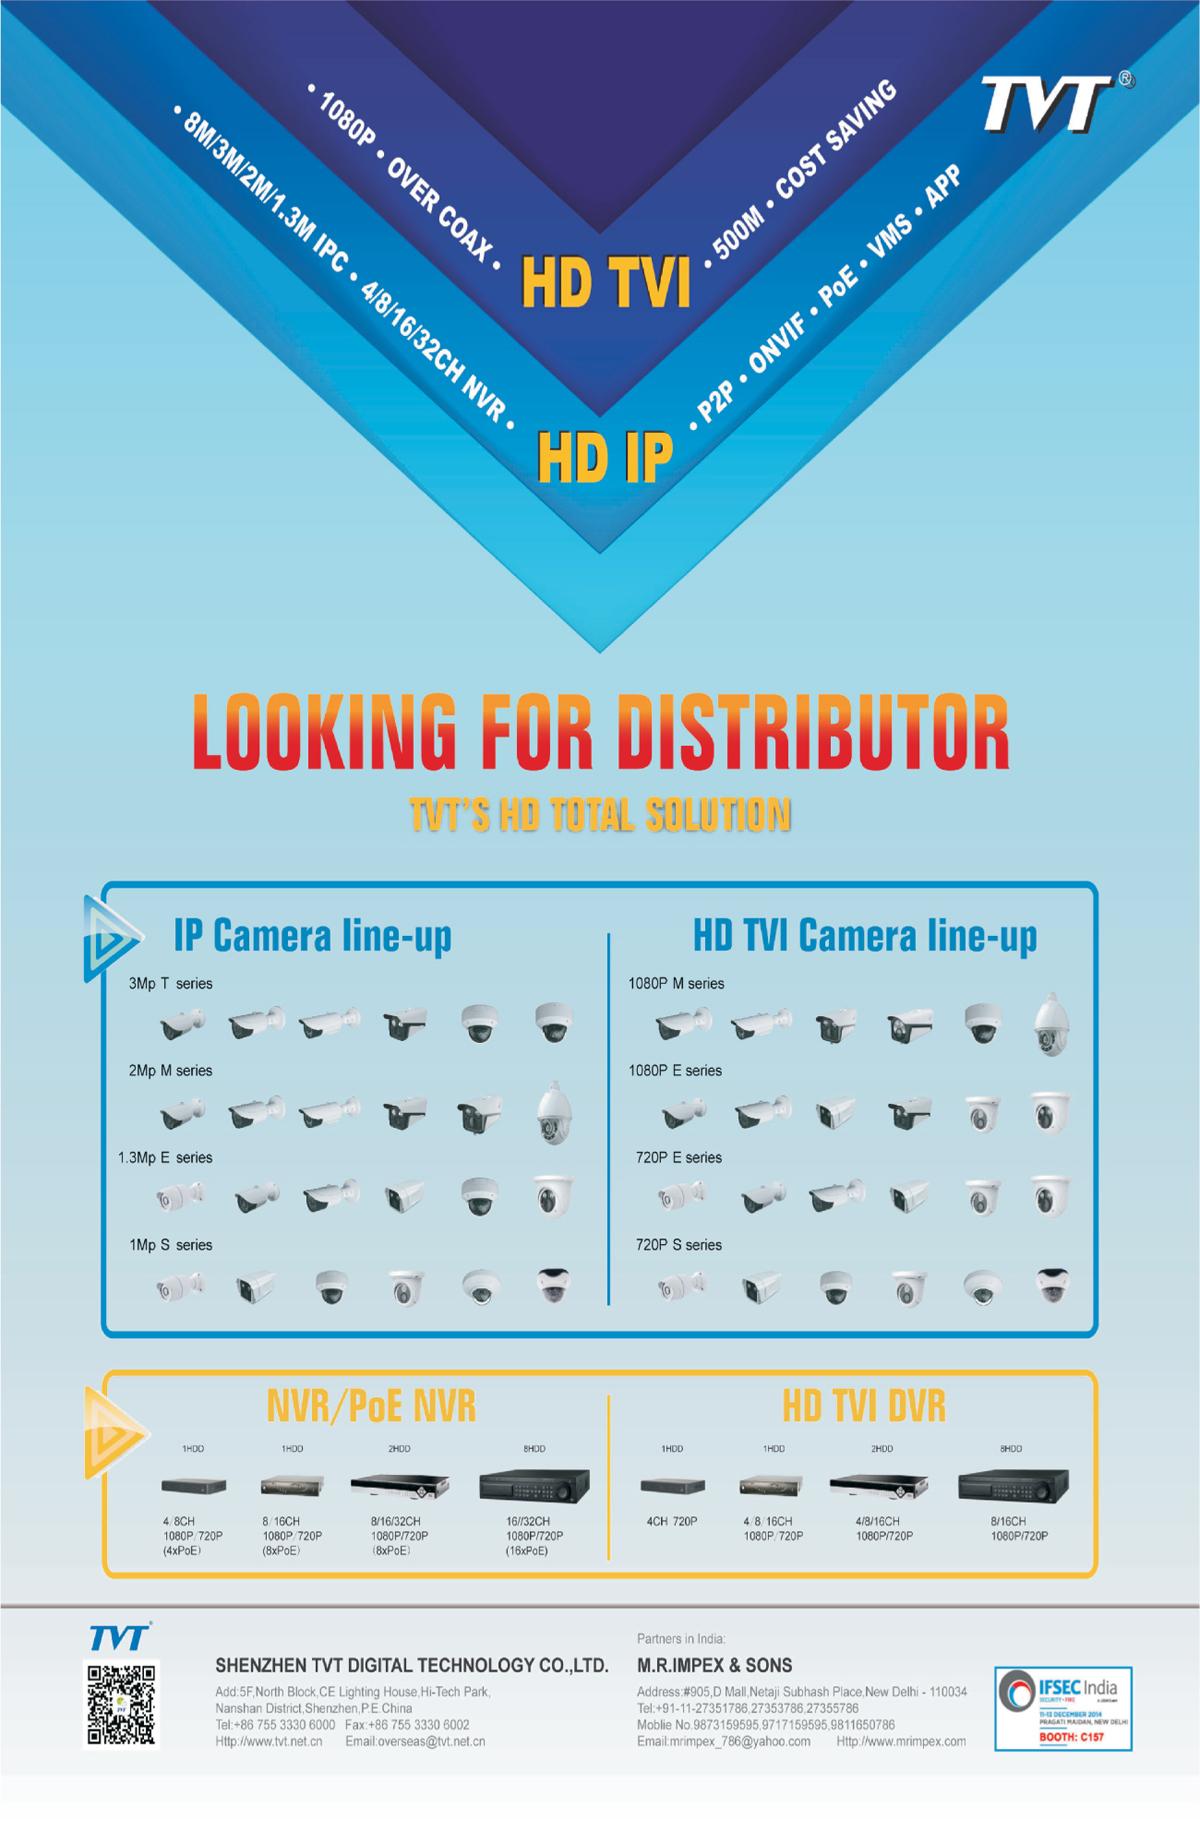 IP Cameras, HD TVI Cameras, NVR, POE NVR, HD TVI Digital Video Recorders, TVI DVR,